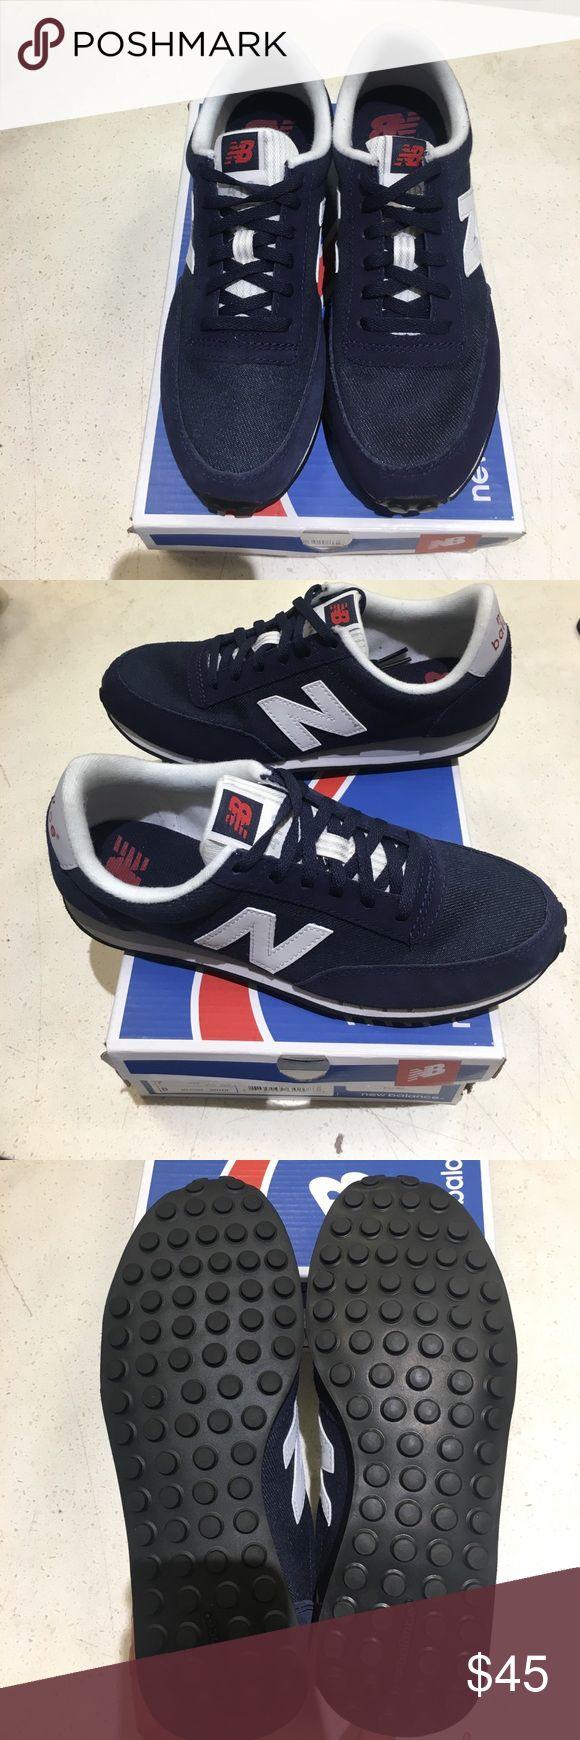 Brand new in box navy blue new balance sneakers Brand new in box navy blue new balance sneakers. 100% Authentic New Balance Shoes Sneakers